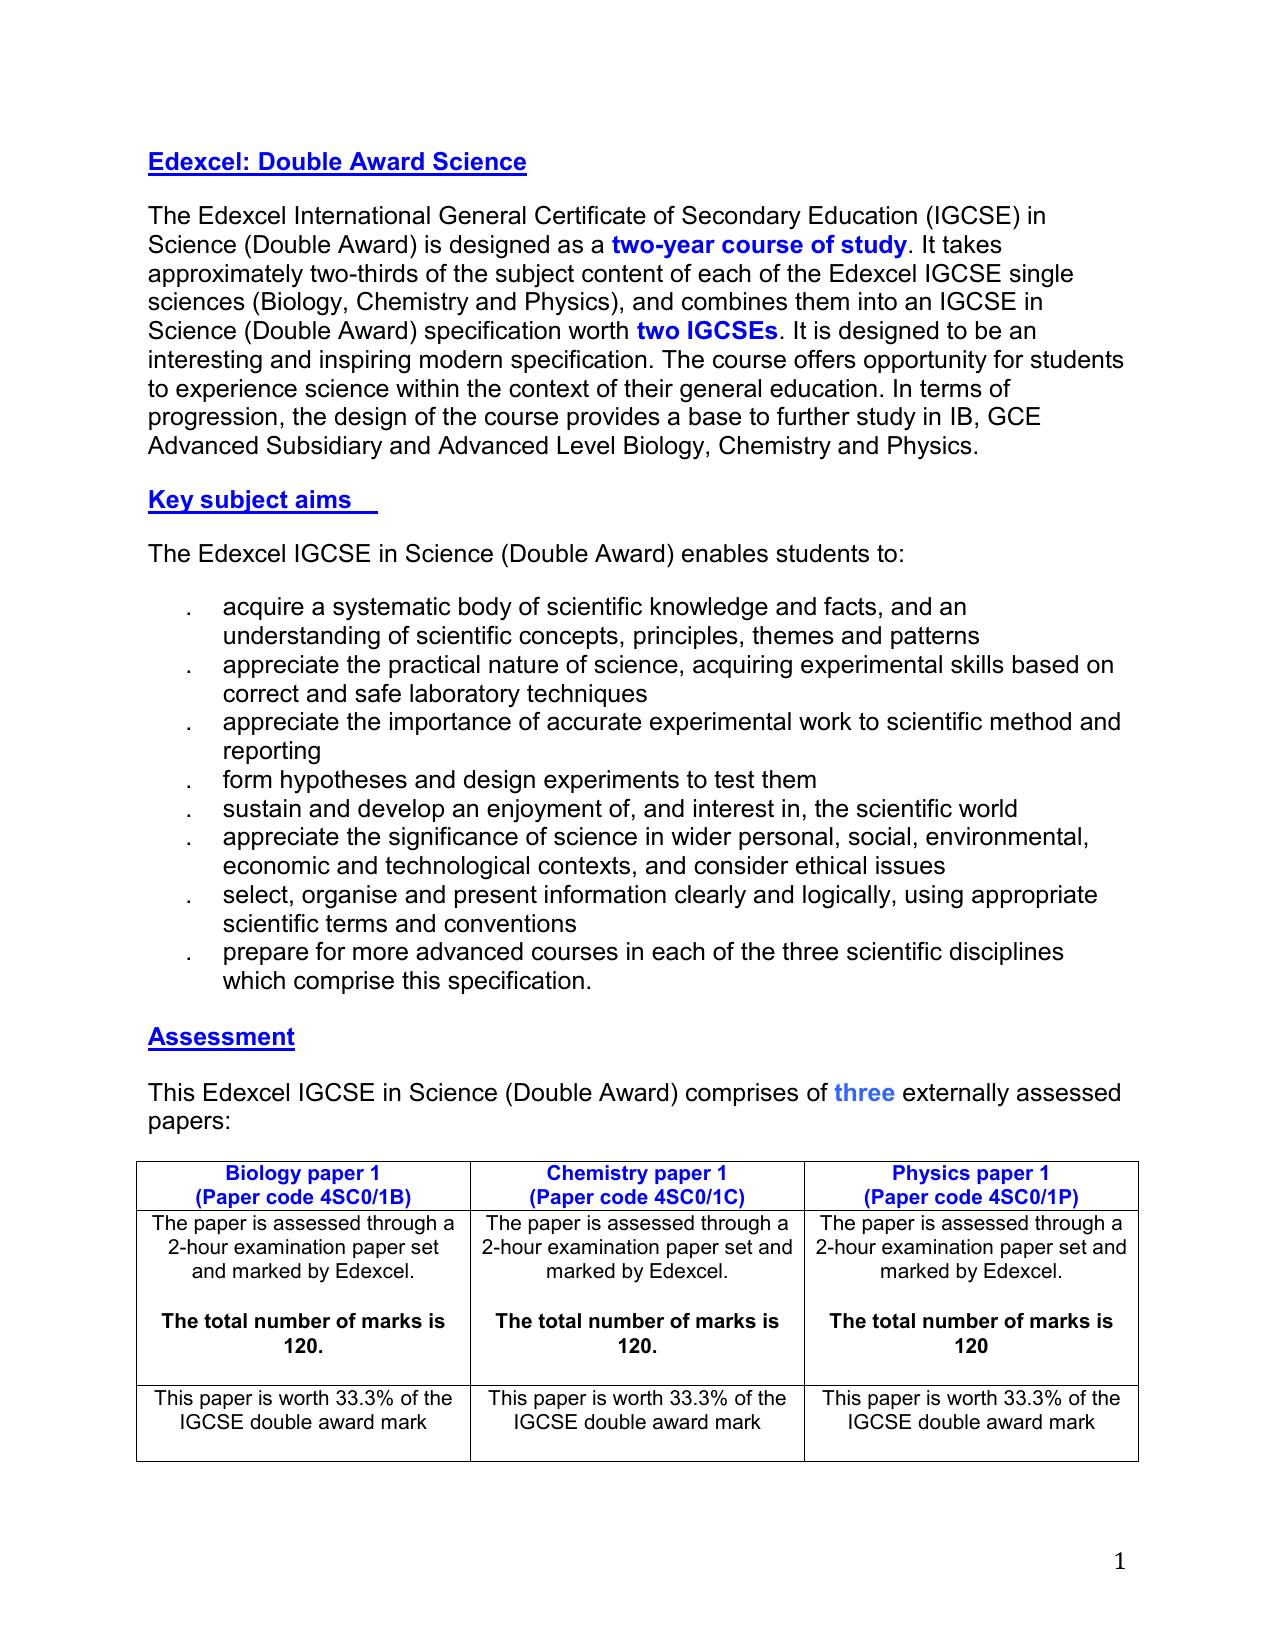 IGCSE- Overview of Edexcel Science